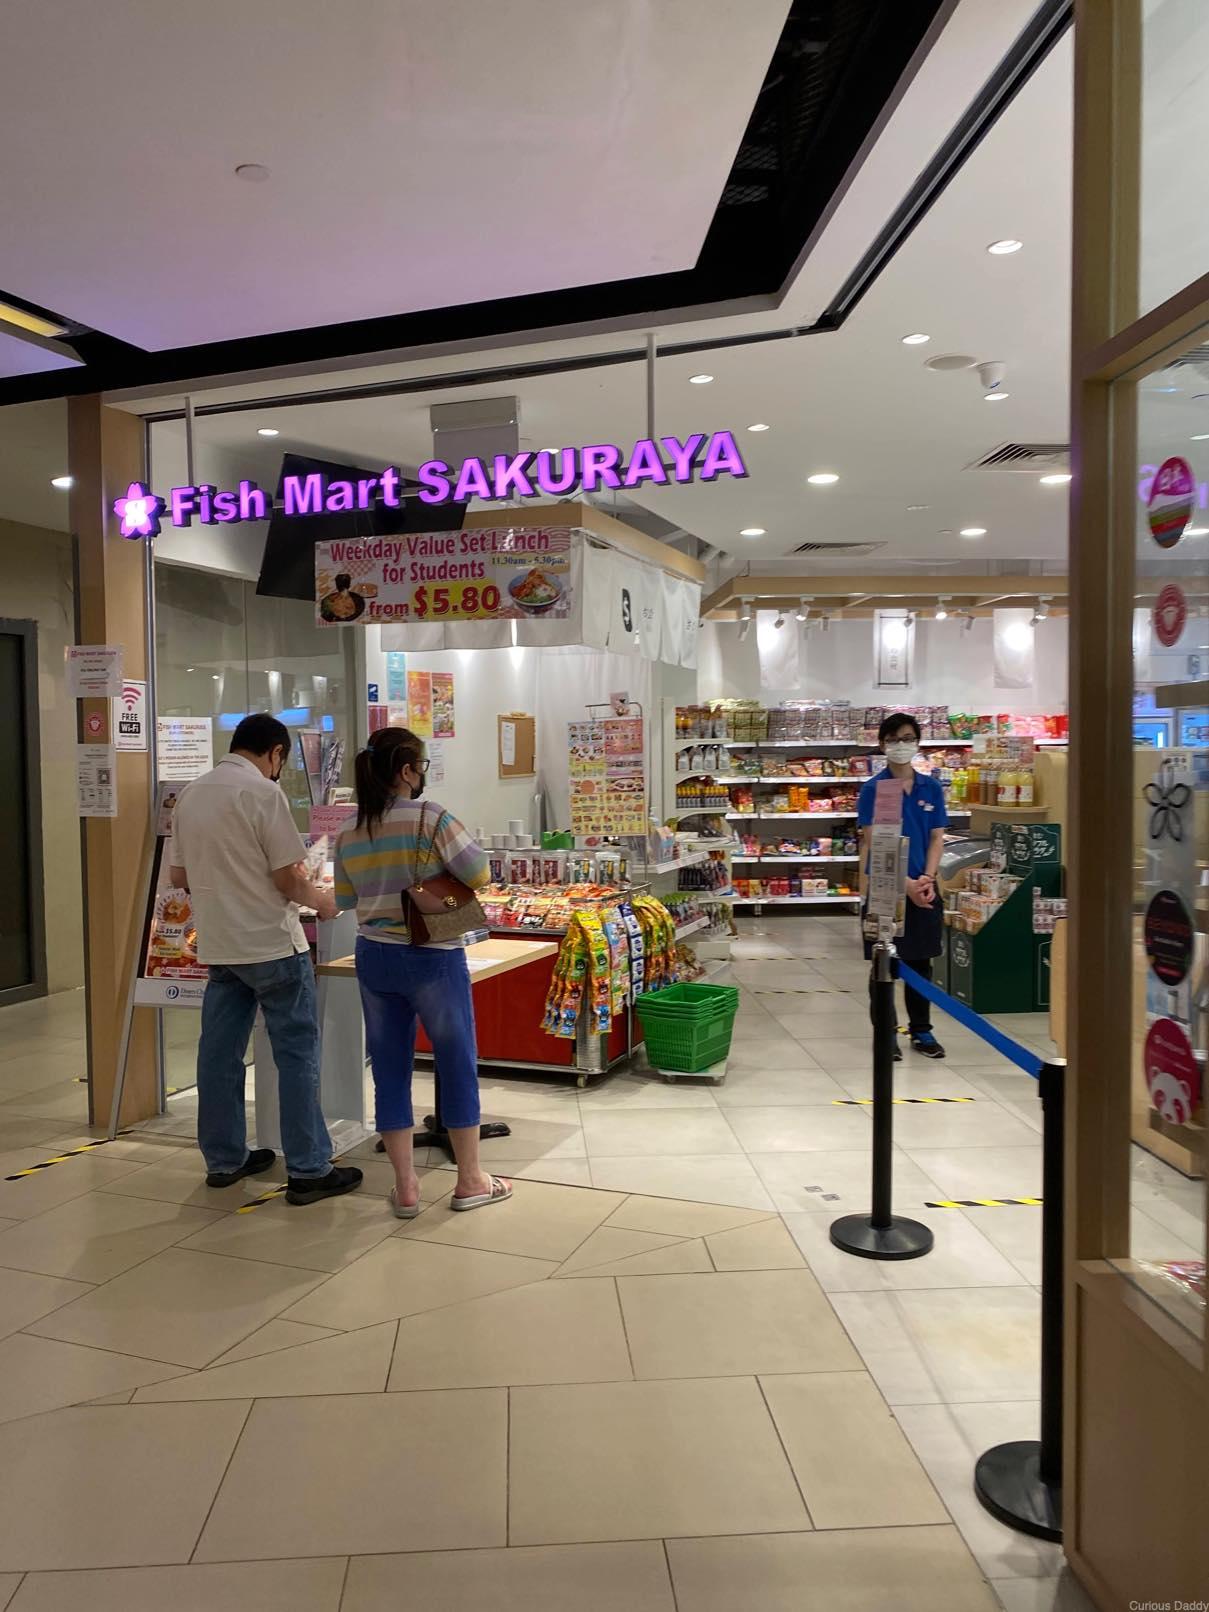 seletar mall Sakuraya